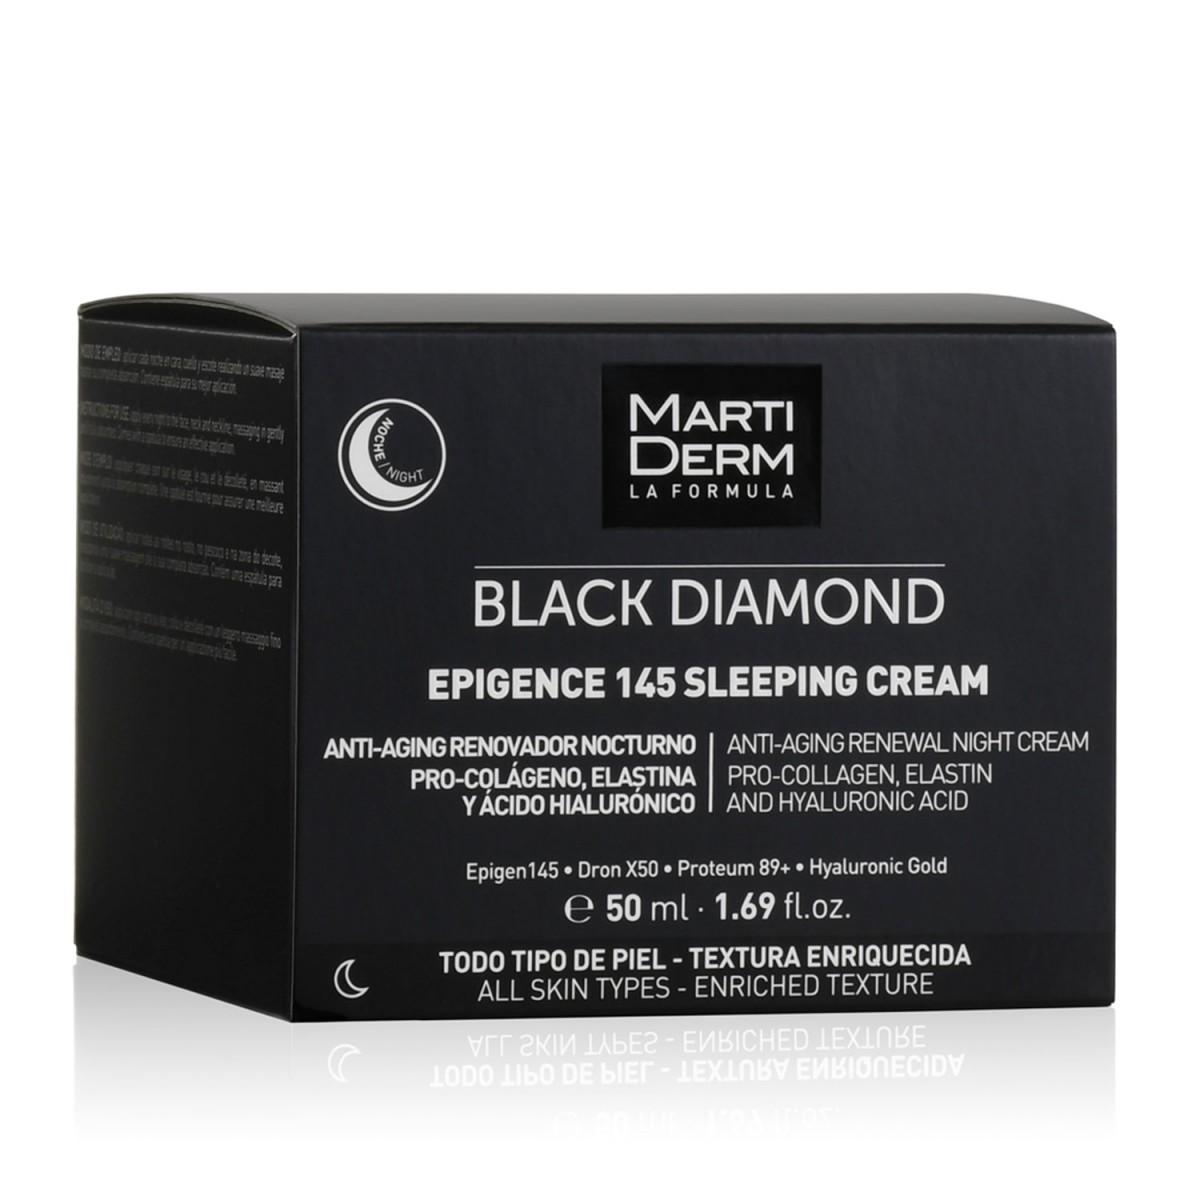 Ночной крем Martiderm Black Diamond Epigence 145 Sleeping Cream